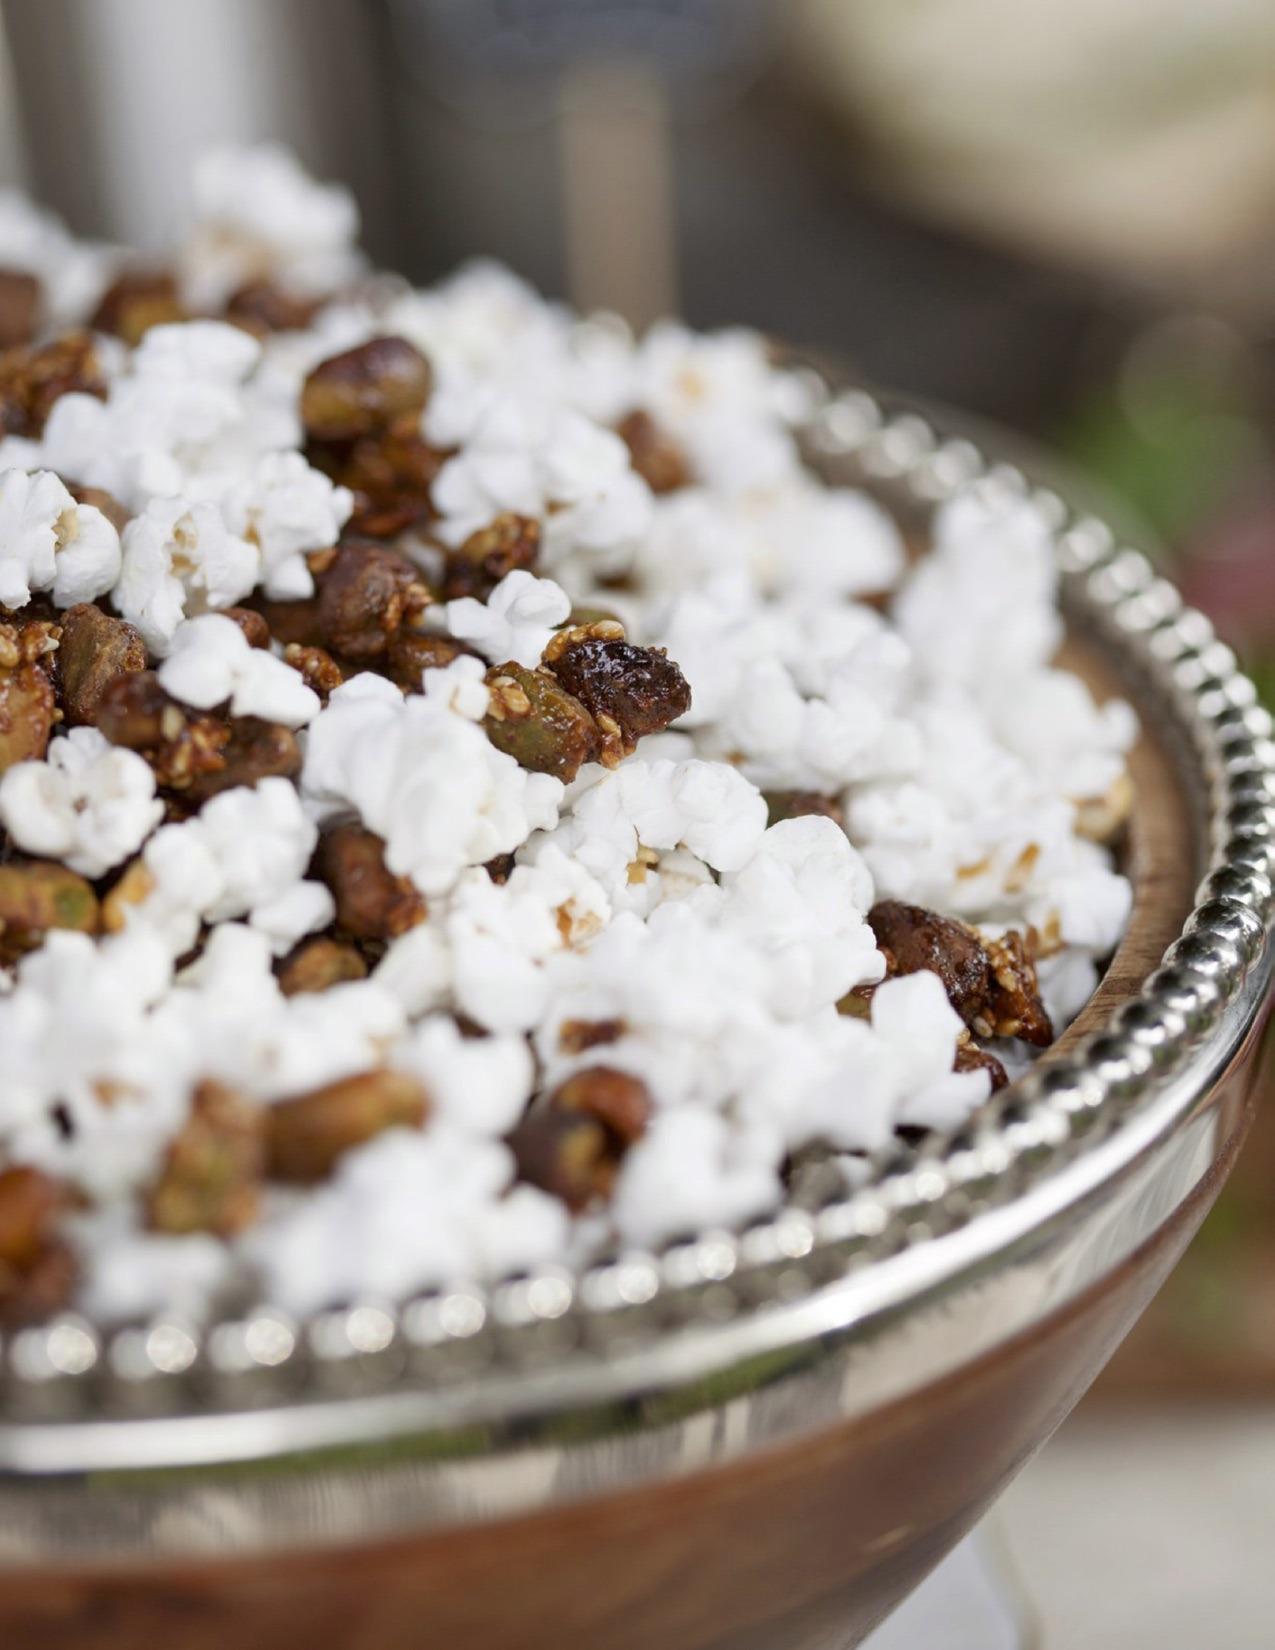 Sesame Glazed Pistachio Popcorn